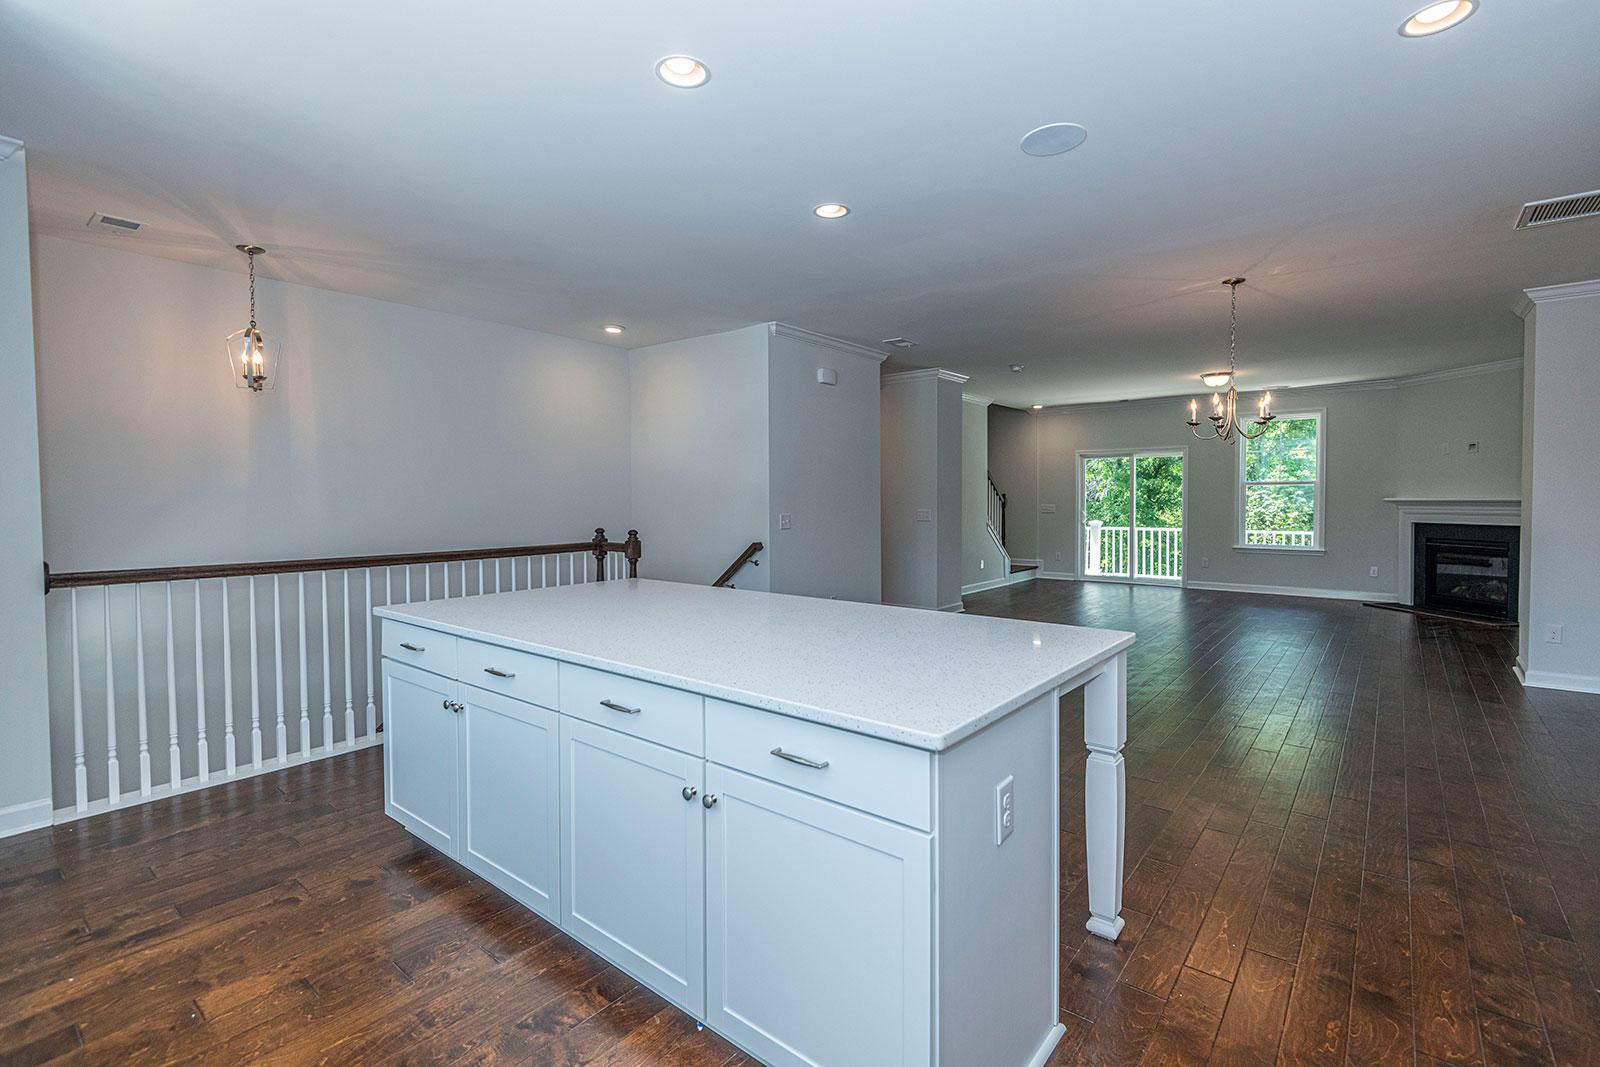 Park West Homes For Sale - 1565 Moss Spring, Mount Pleasant, SC - 16